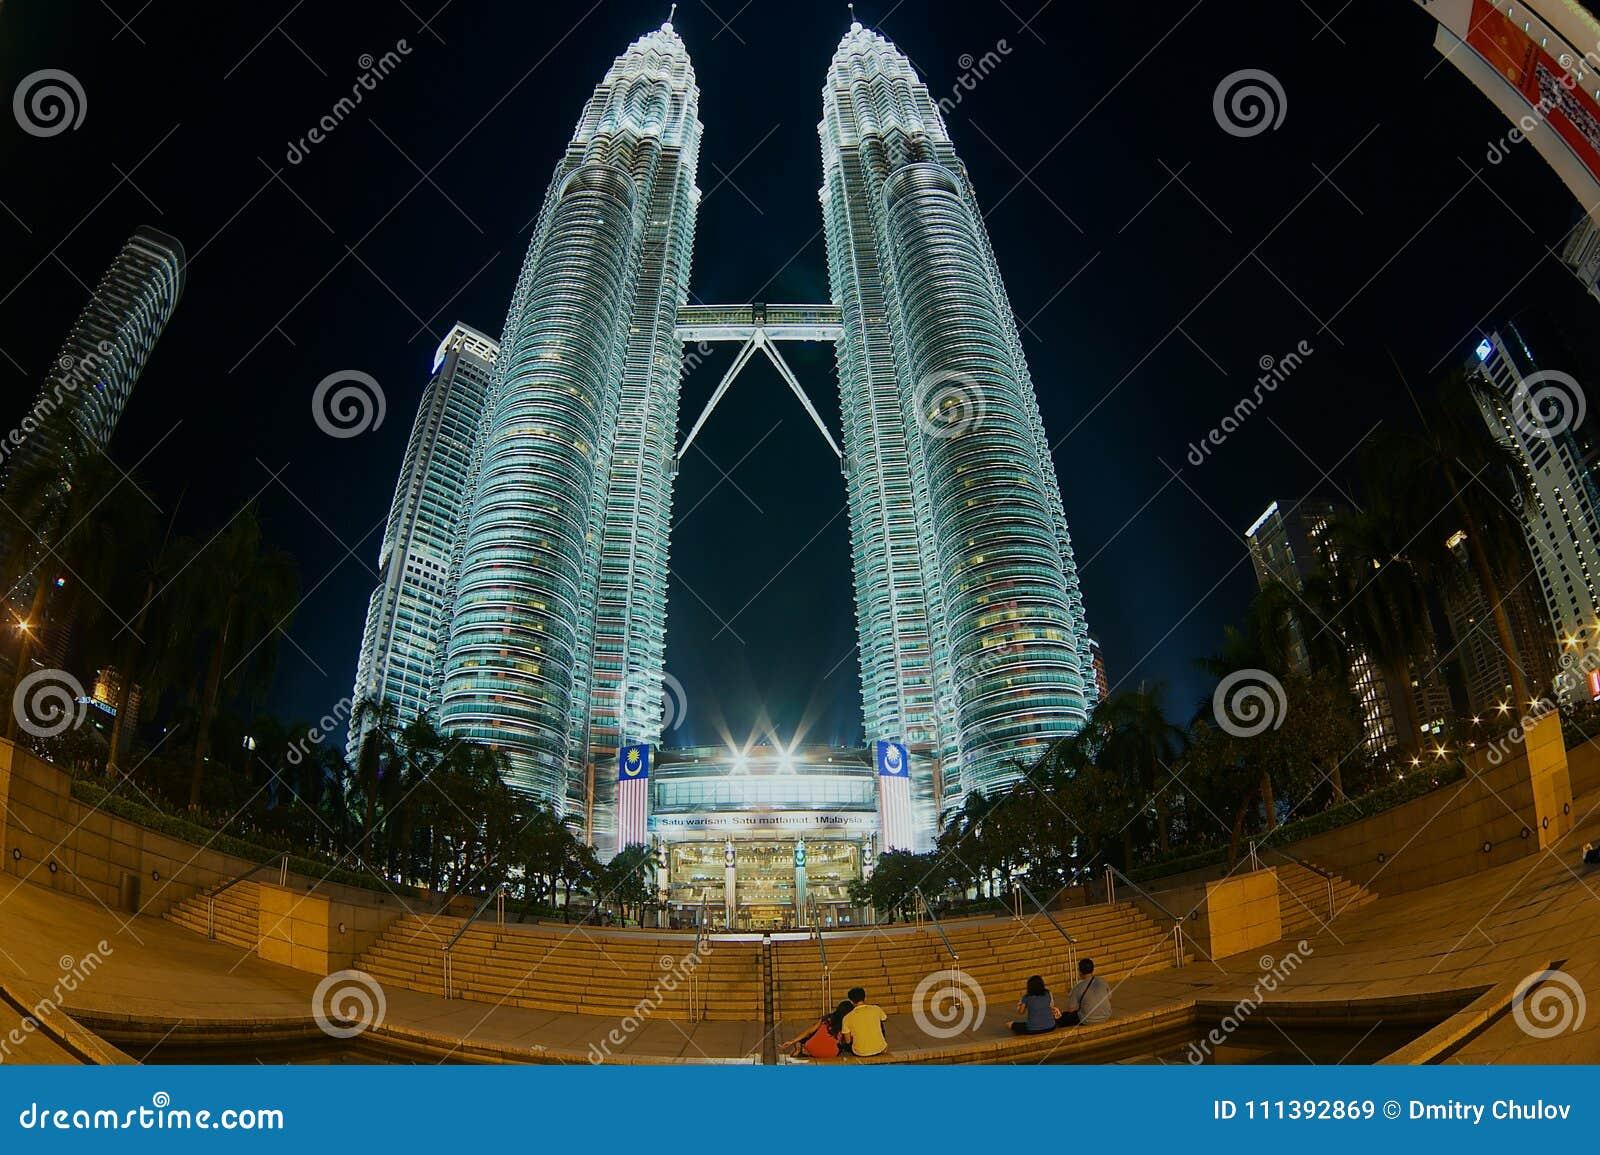 Majestic night view to the Petronas twin towers and surrounding buildings in Kuala Lumpur, Malaysia.